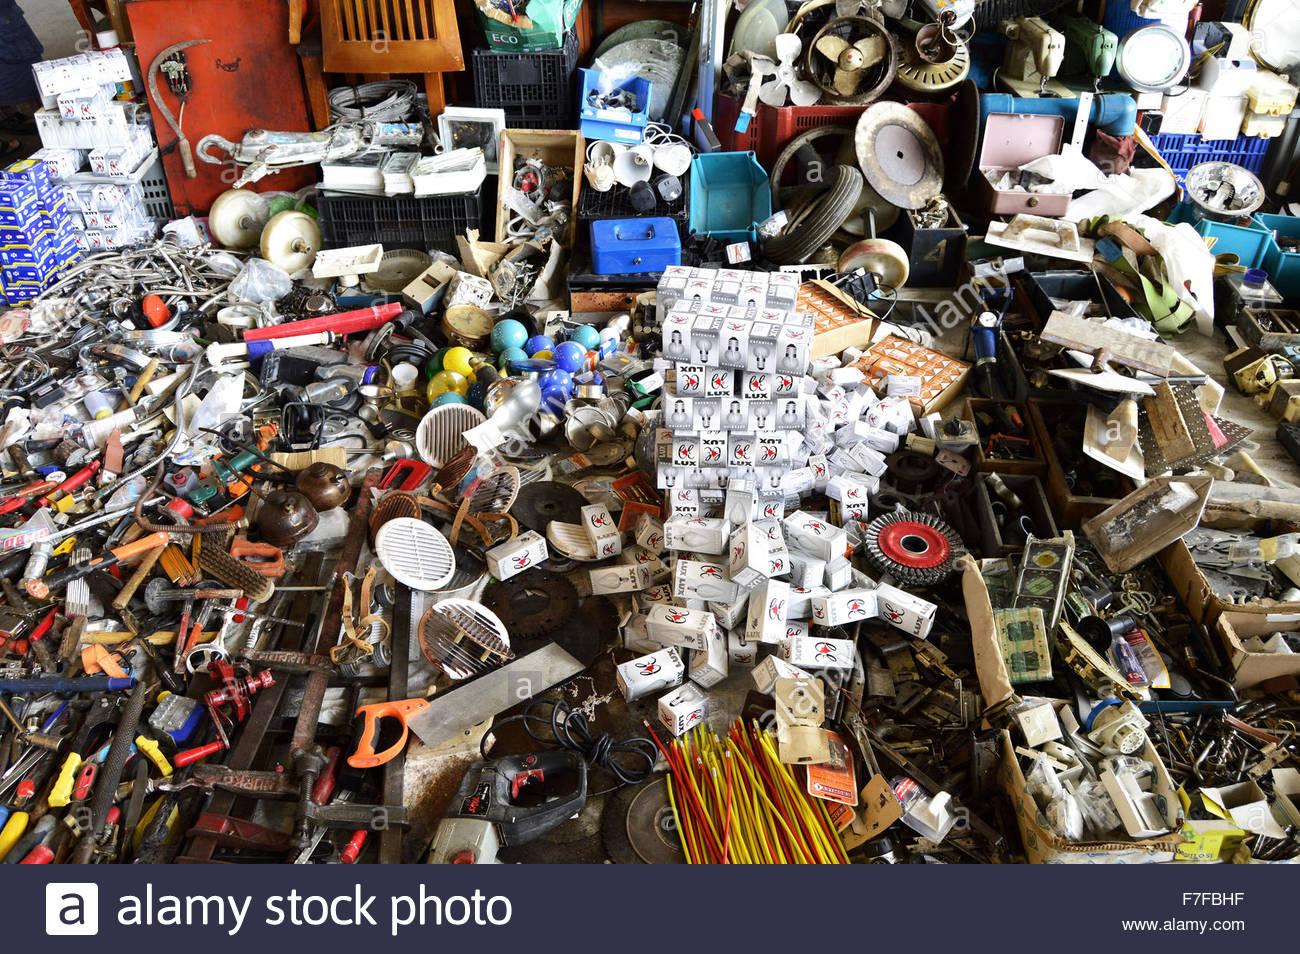 Scrap hardware products displayed at Mercat Del Encants (flea market) in Barcelona Spain Europe - Stock Image